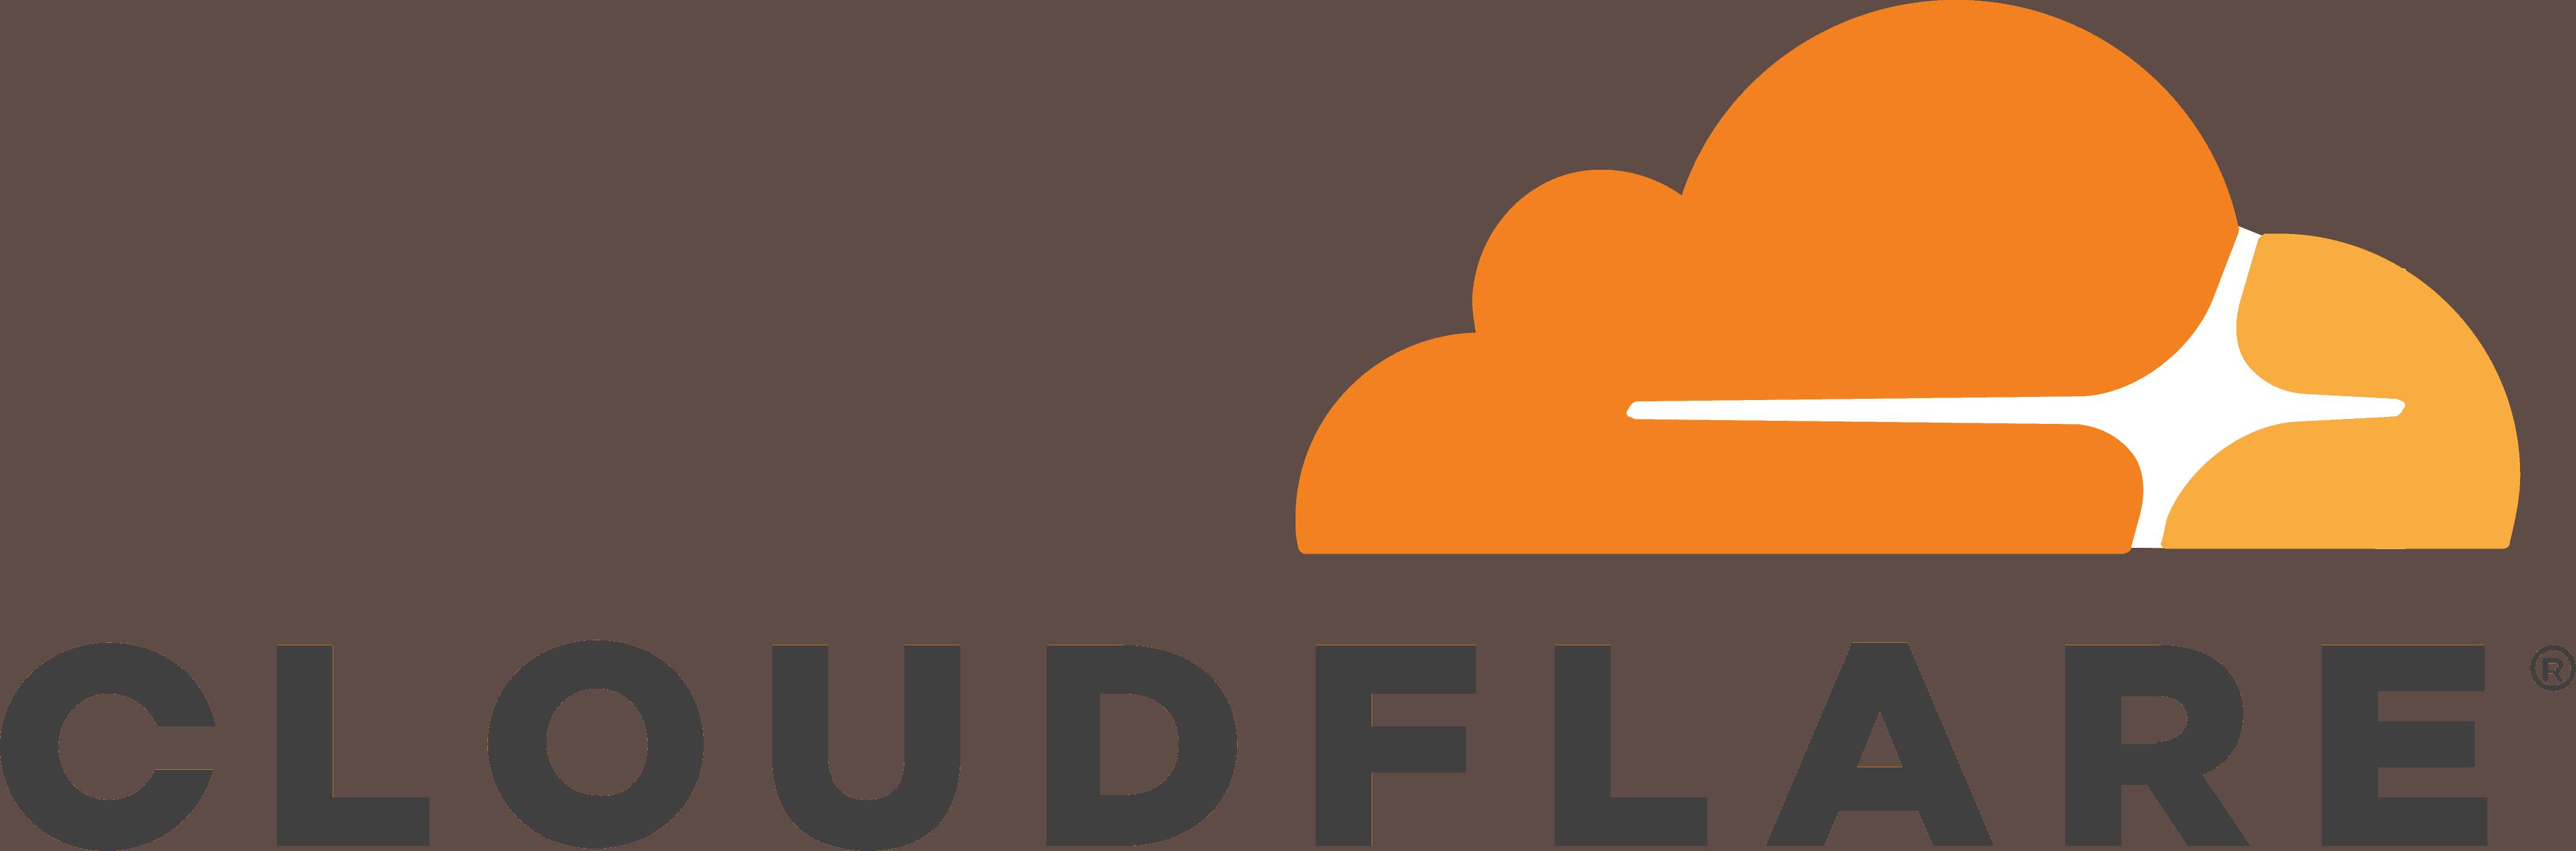 cloudflare-logo-7